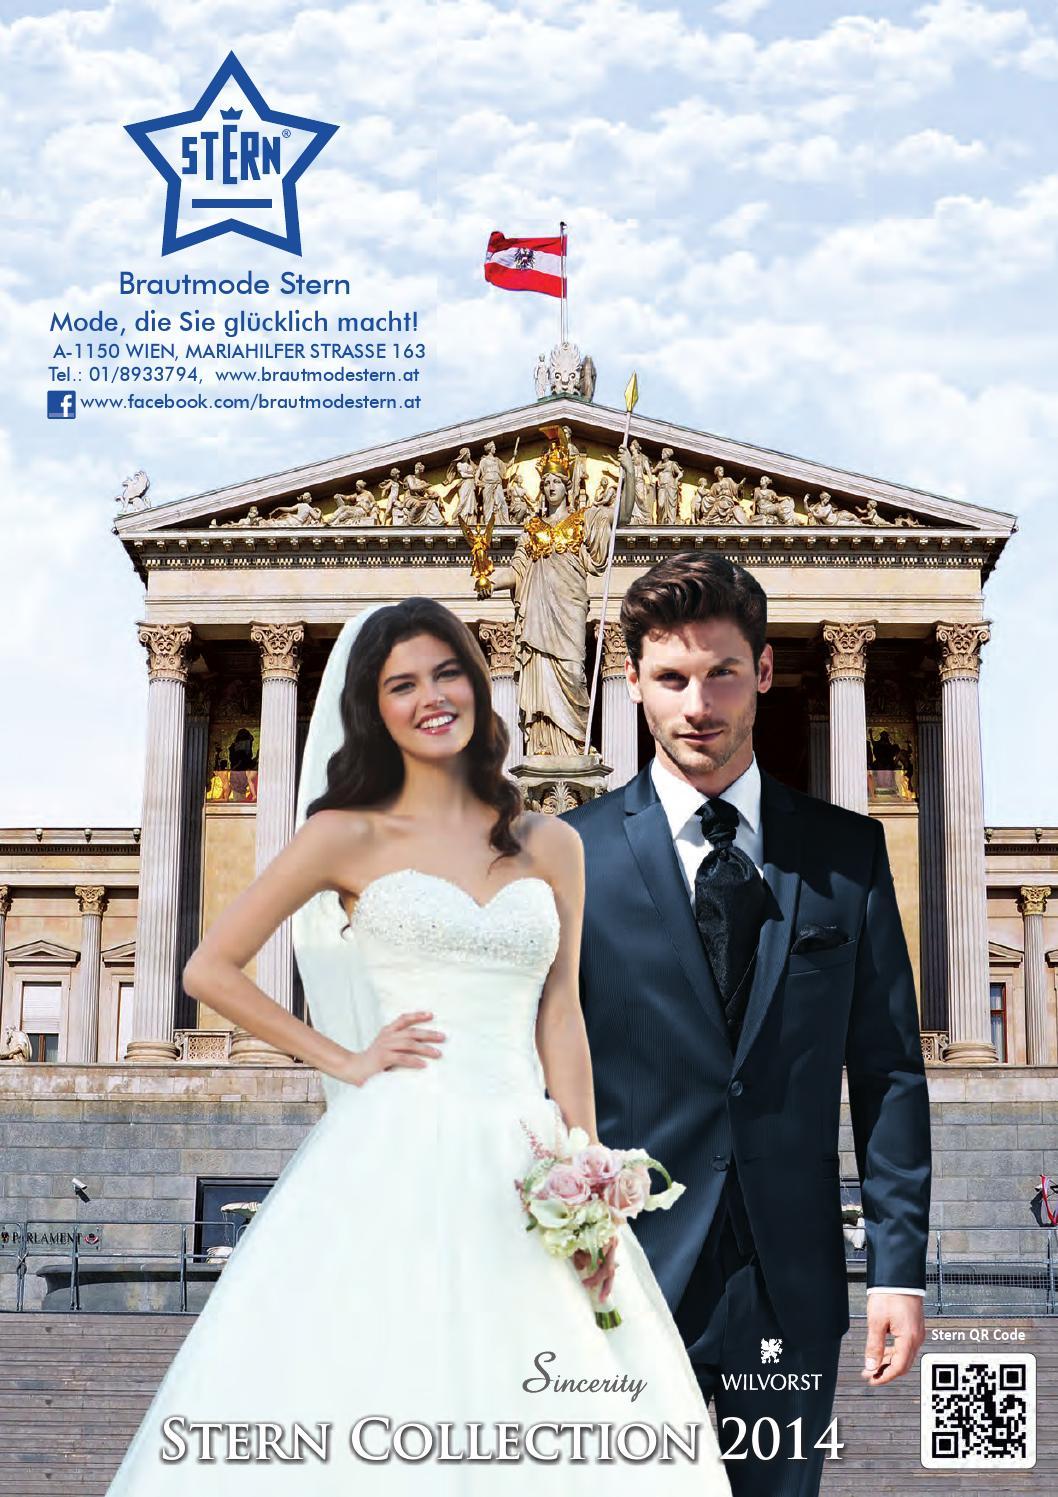 Brautmode Stern Katalog 9 by B&G Consulting & Commerce GmbH - issuu